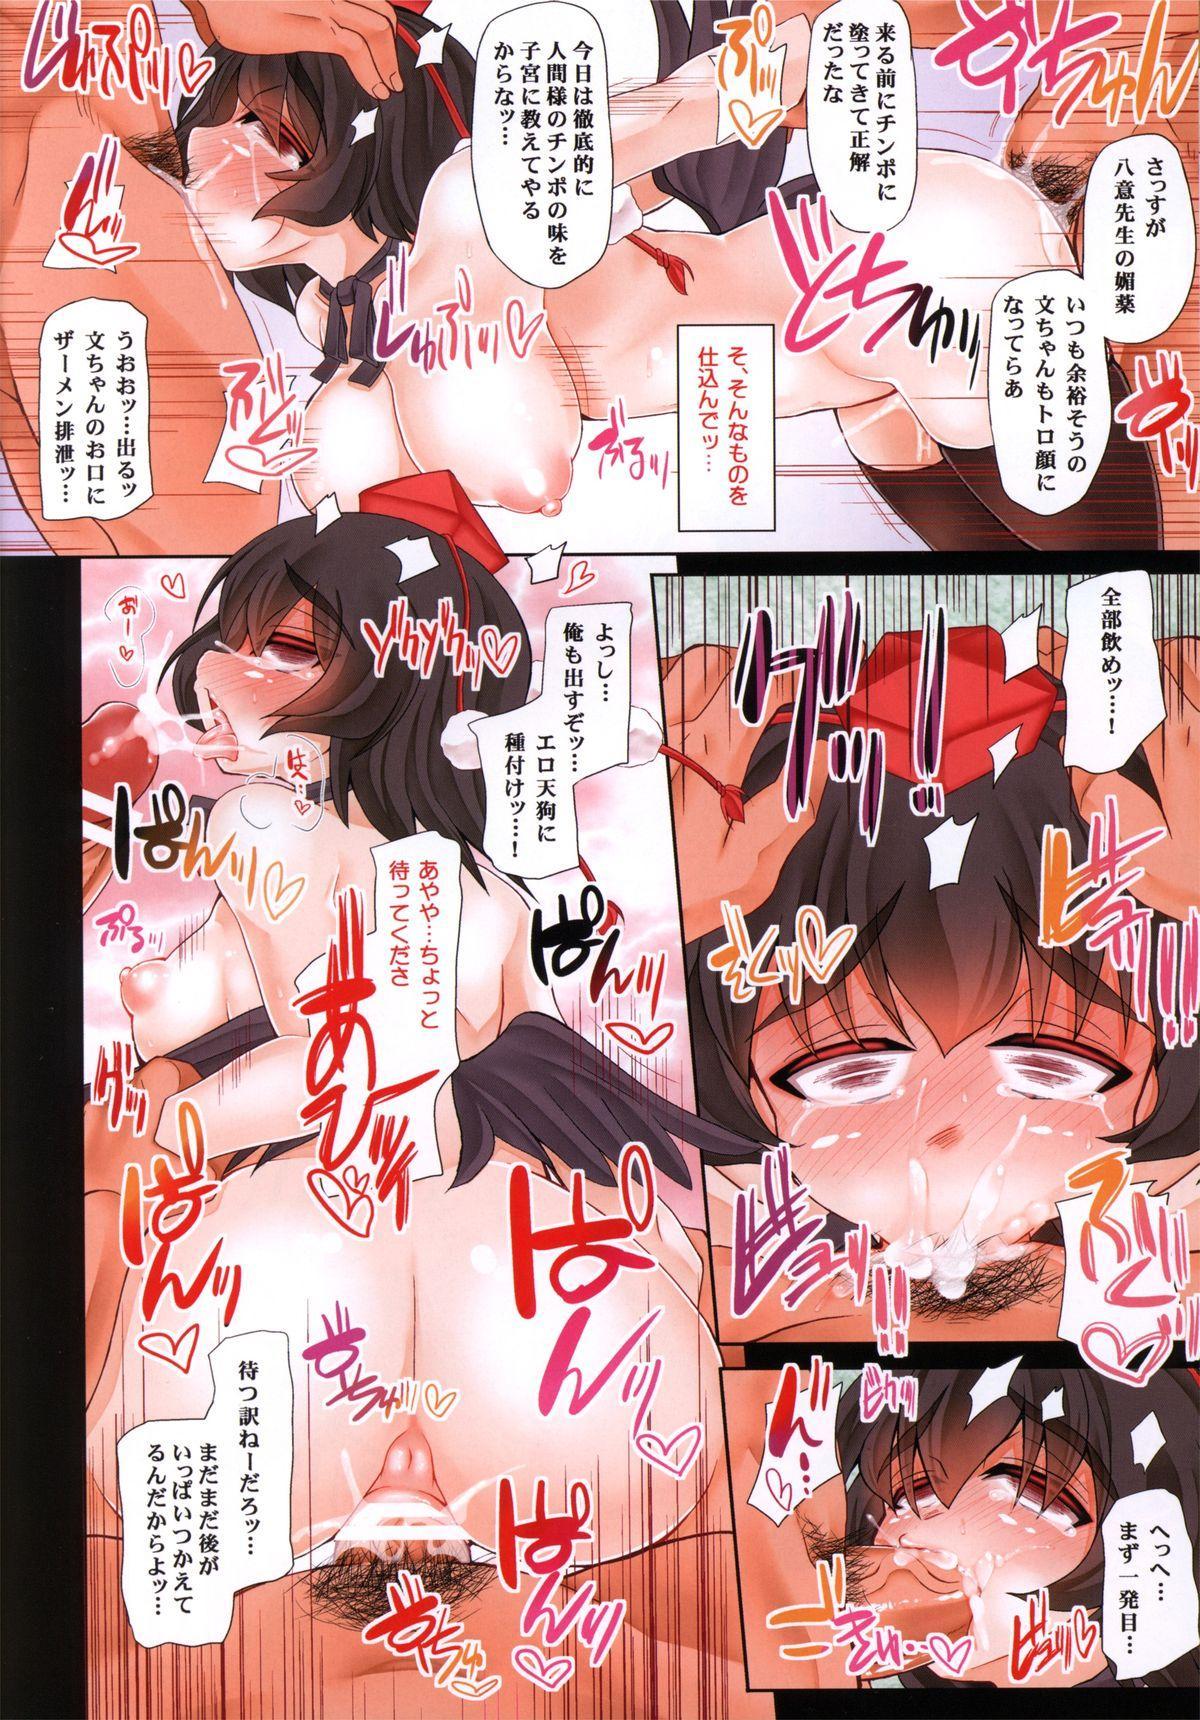 Oidemase Youkai no Yama 7